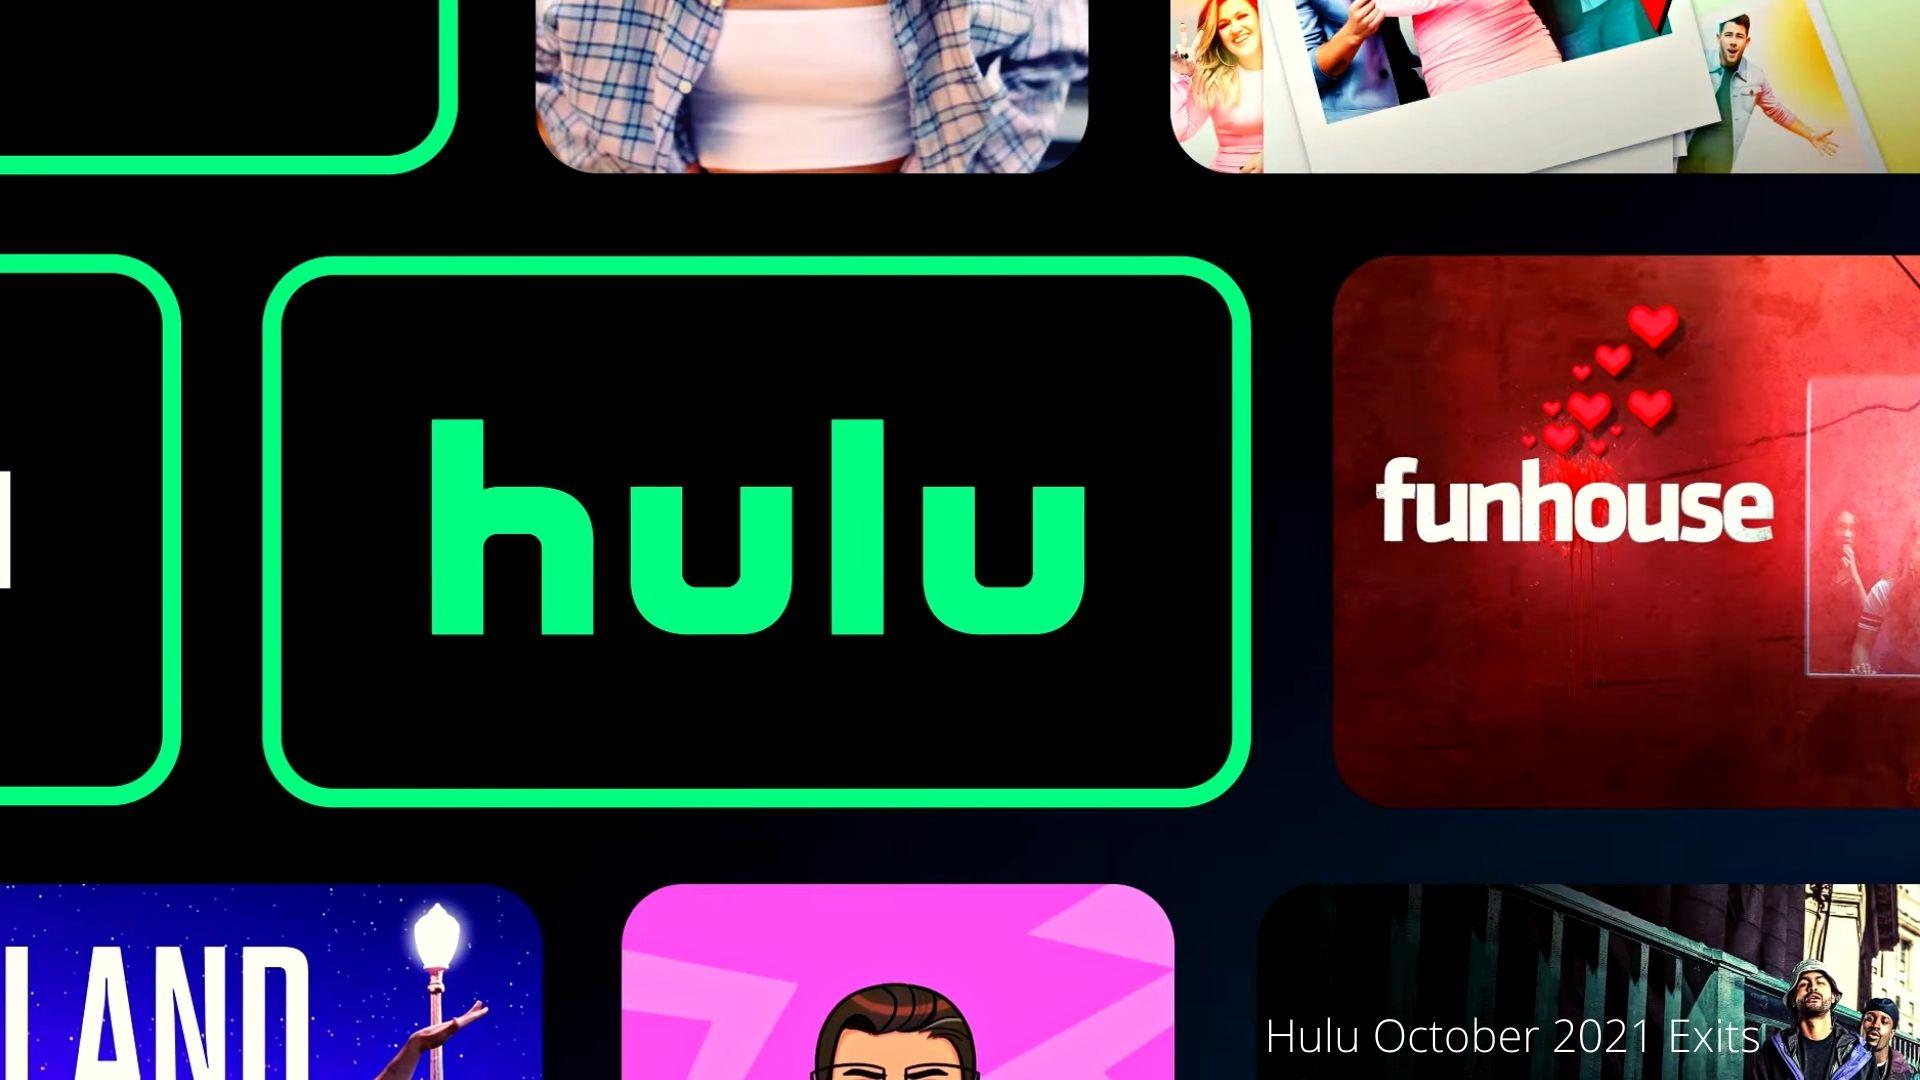 What's Leaving Hulu In October 2021